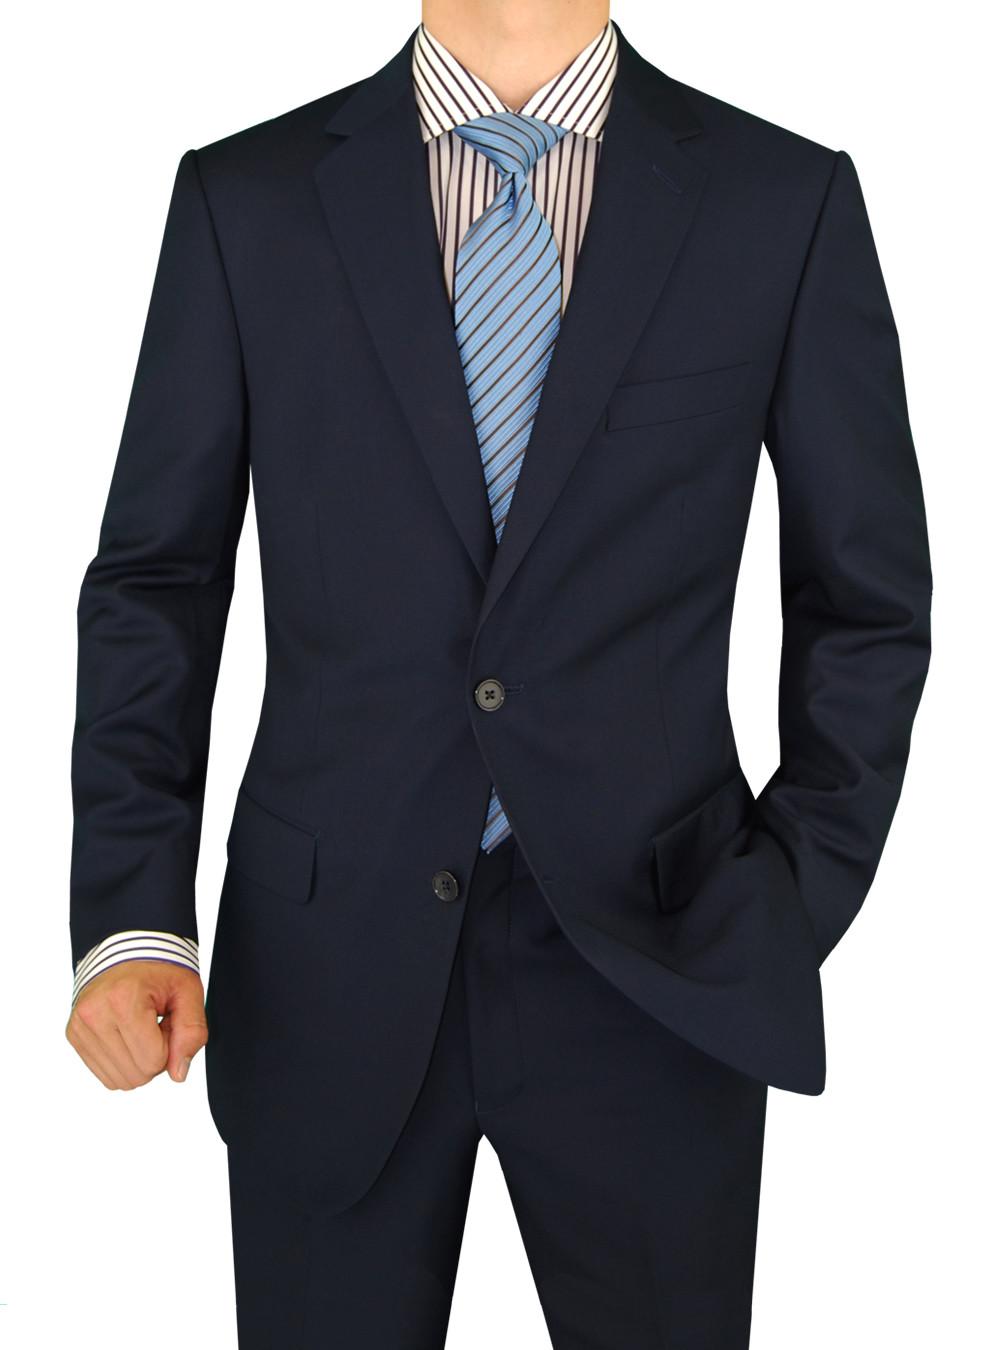 The New Blue Suit  Suits  Mens Wearhouse